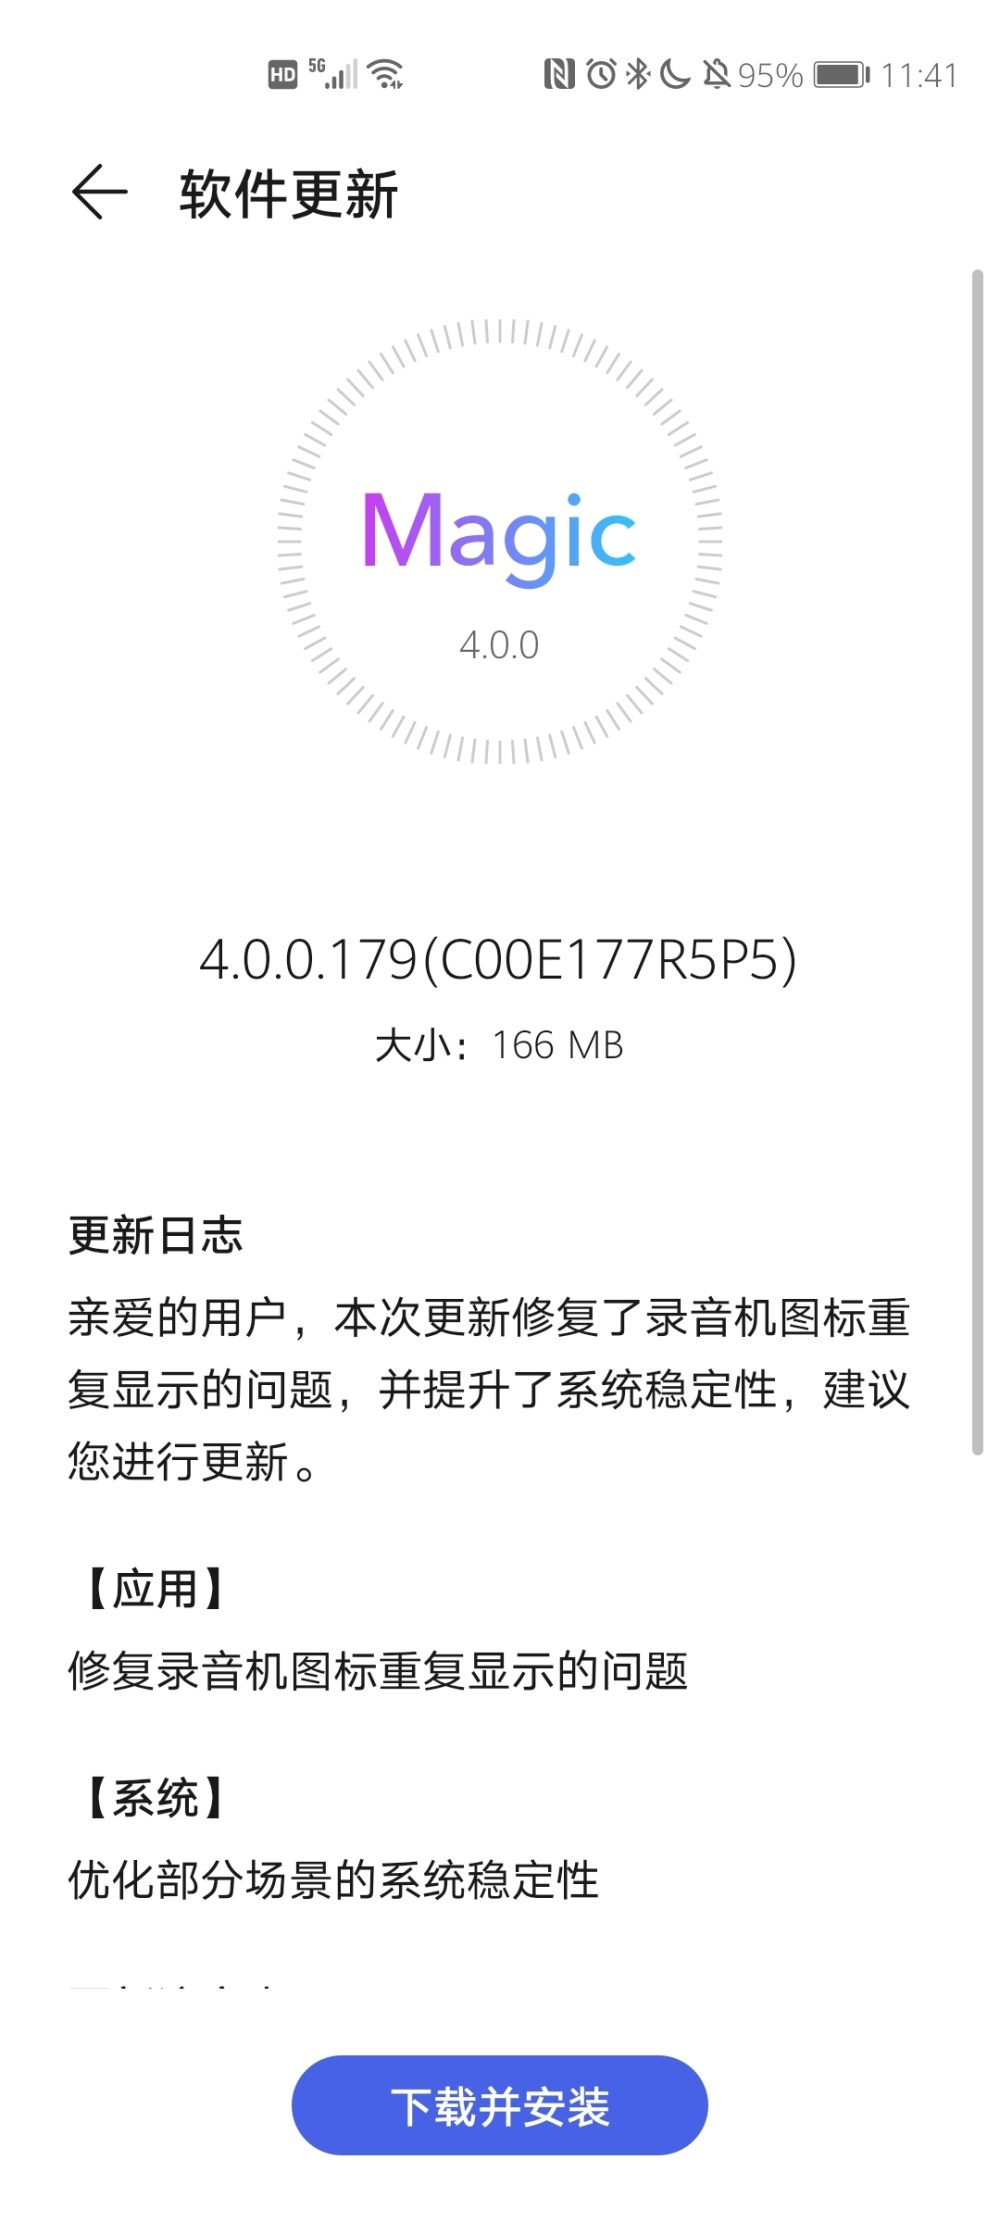 HONOR V30 AND V30 PRO MAGIC UI 4.0.0.179